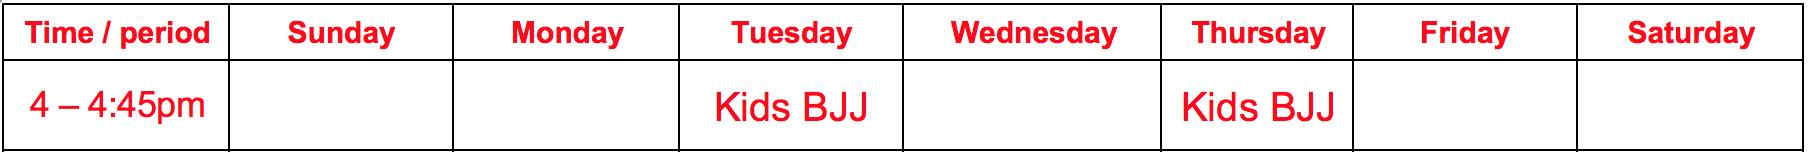 kids_schedule.png